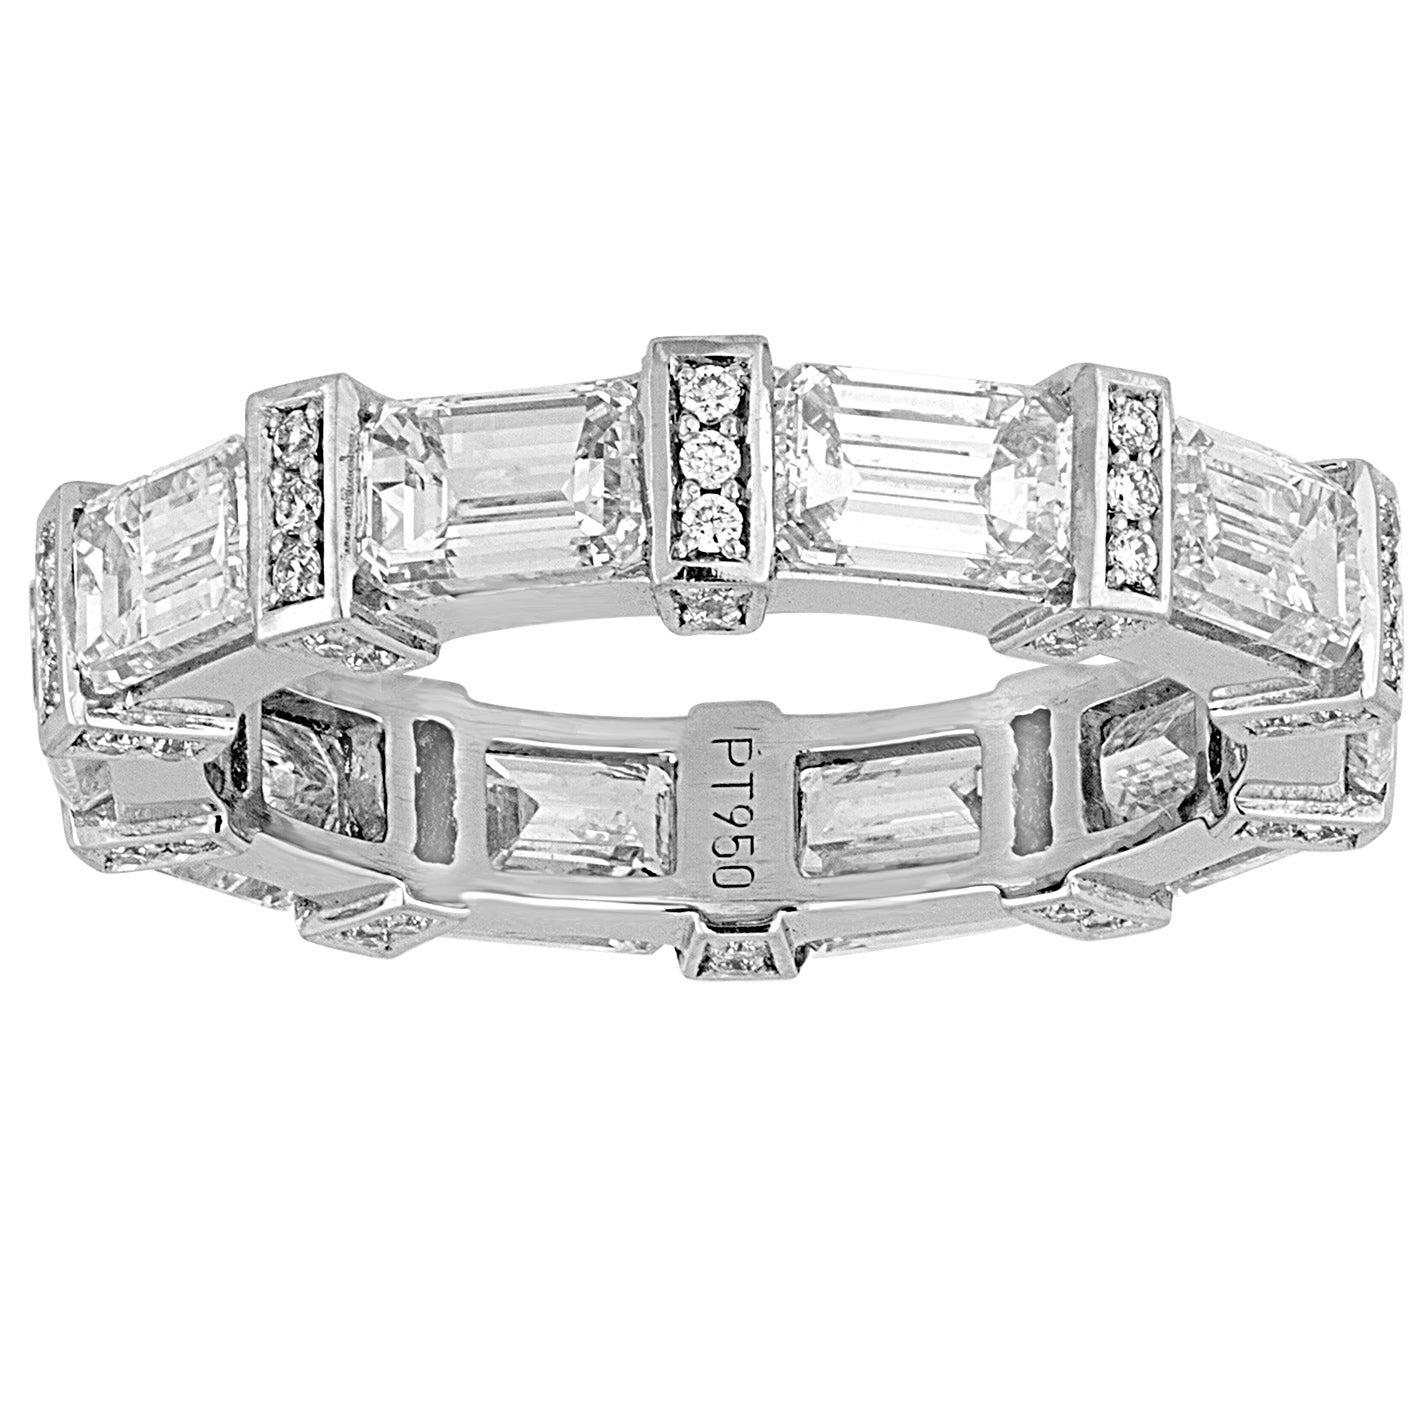 4.39 Carats Diamond Emerald Cut Platinum Eternity Band Ring